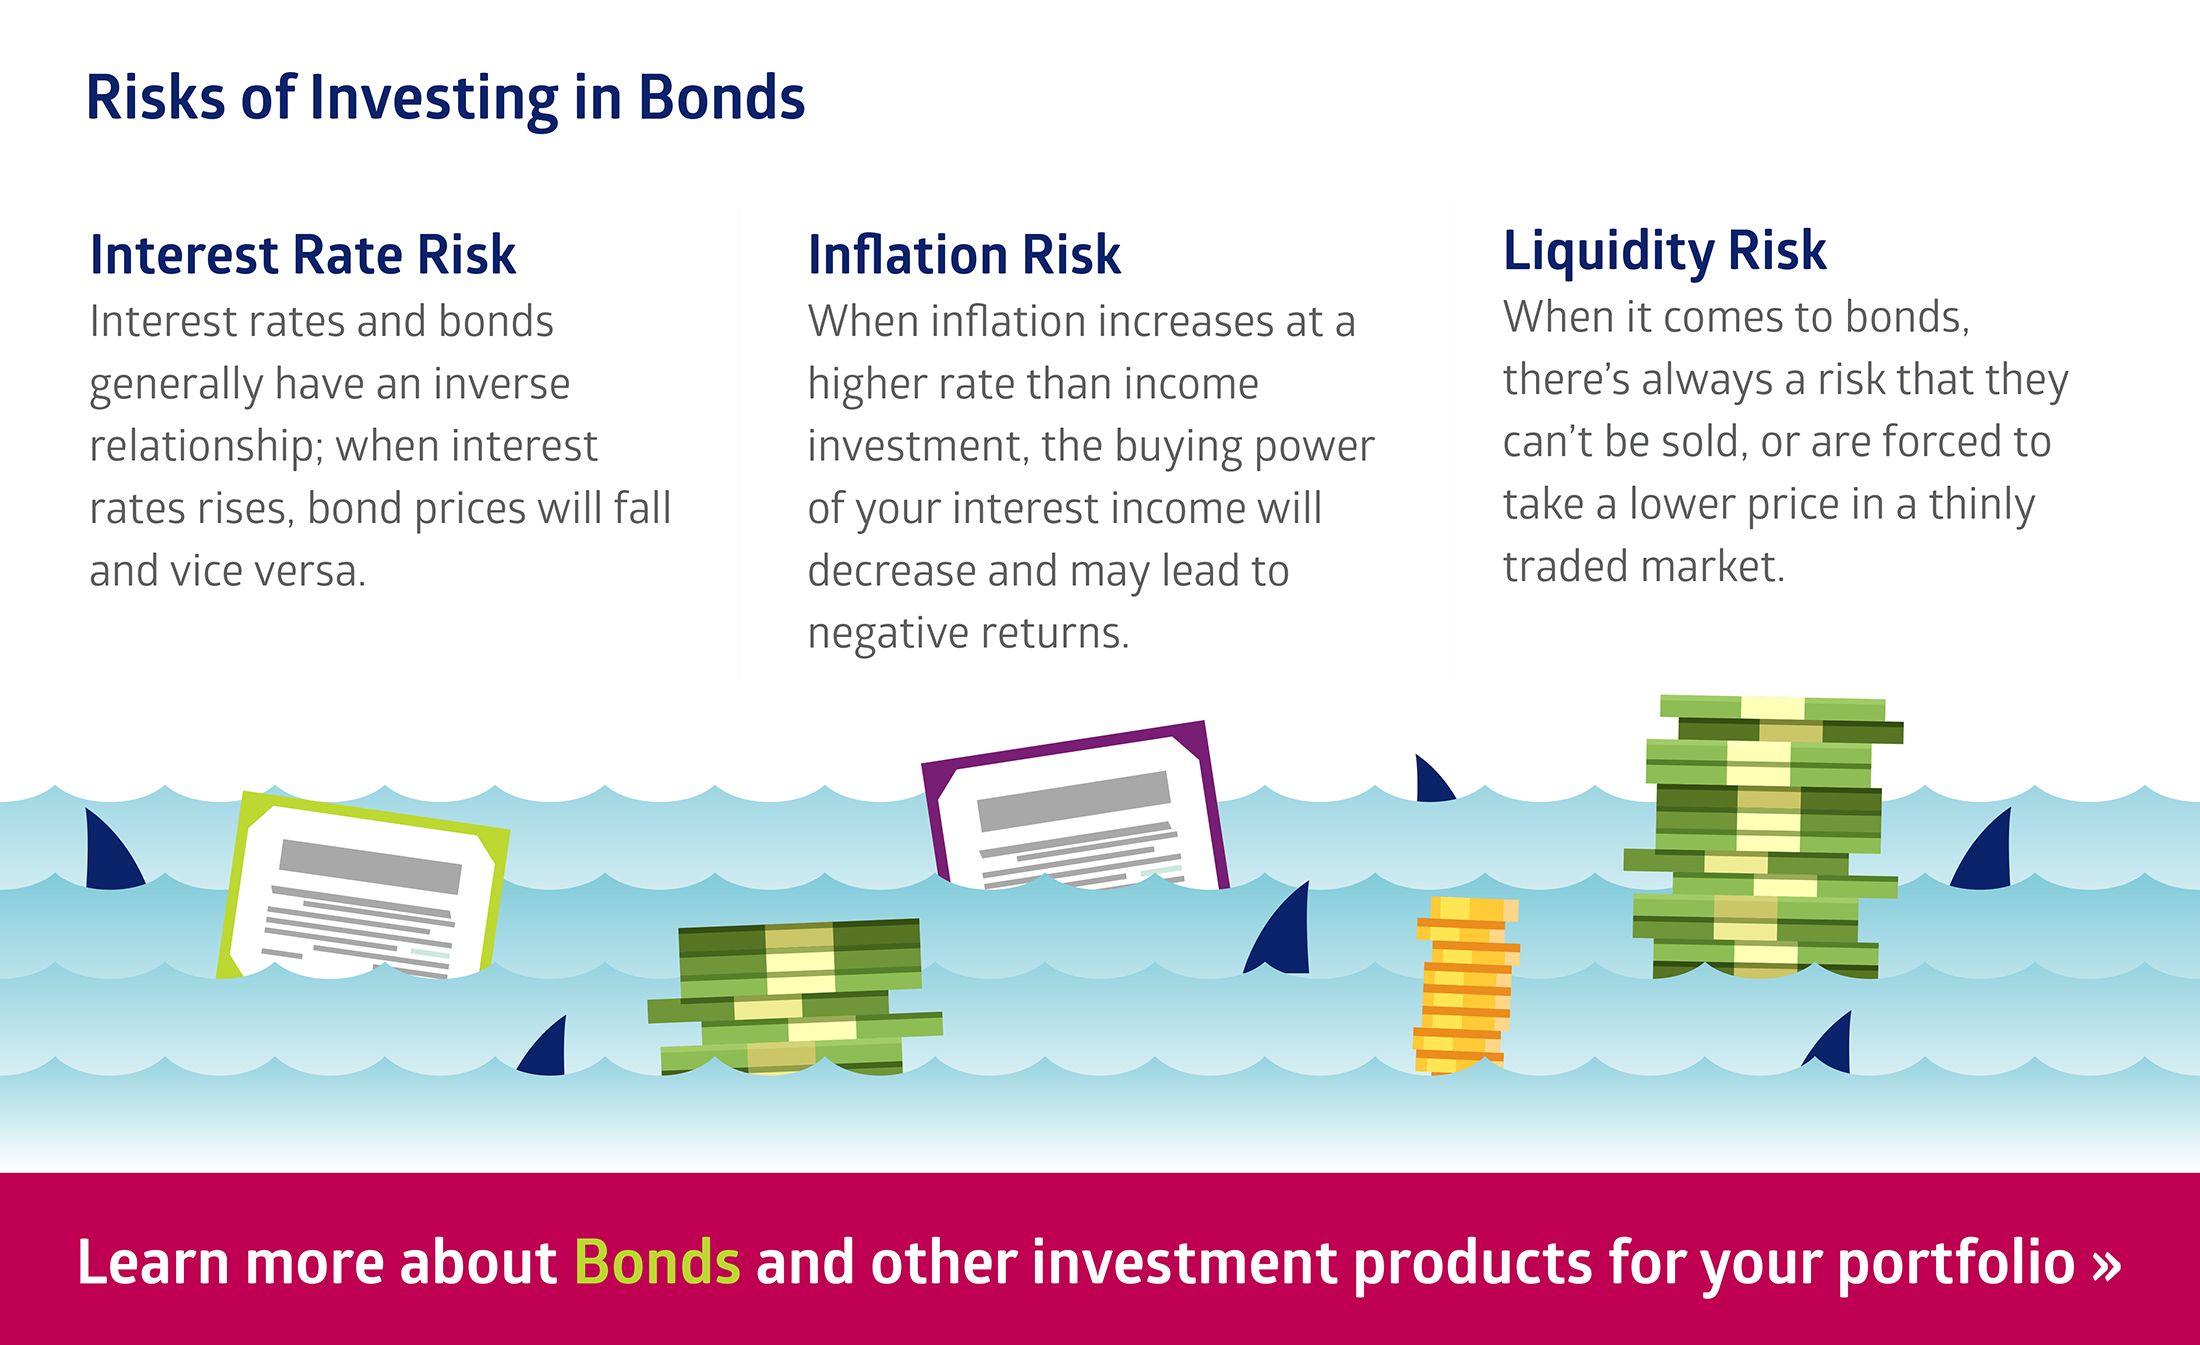 bondsinvesting_05